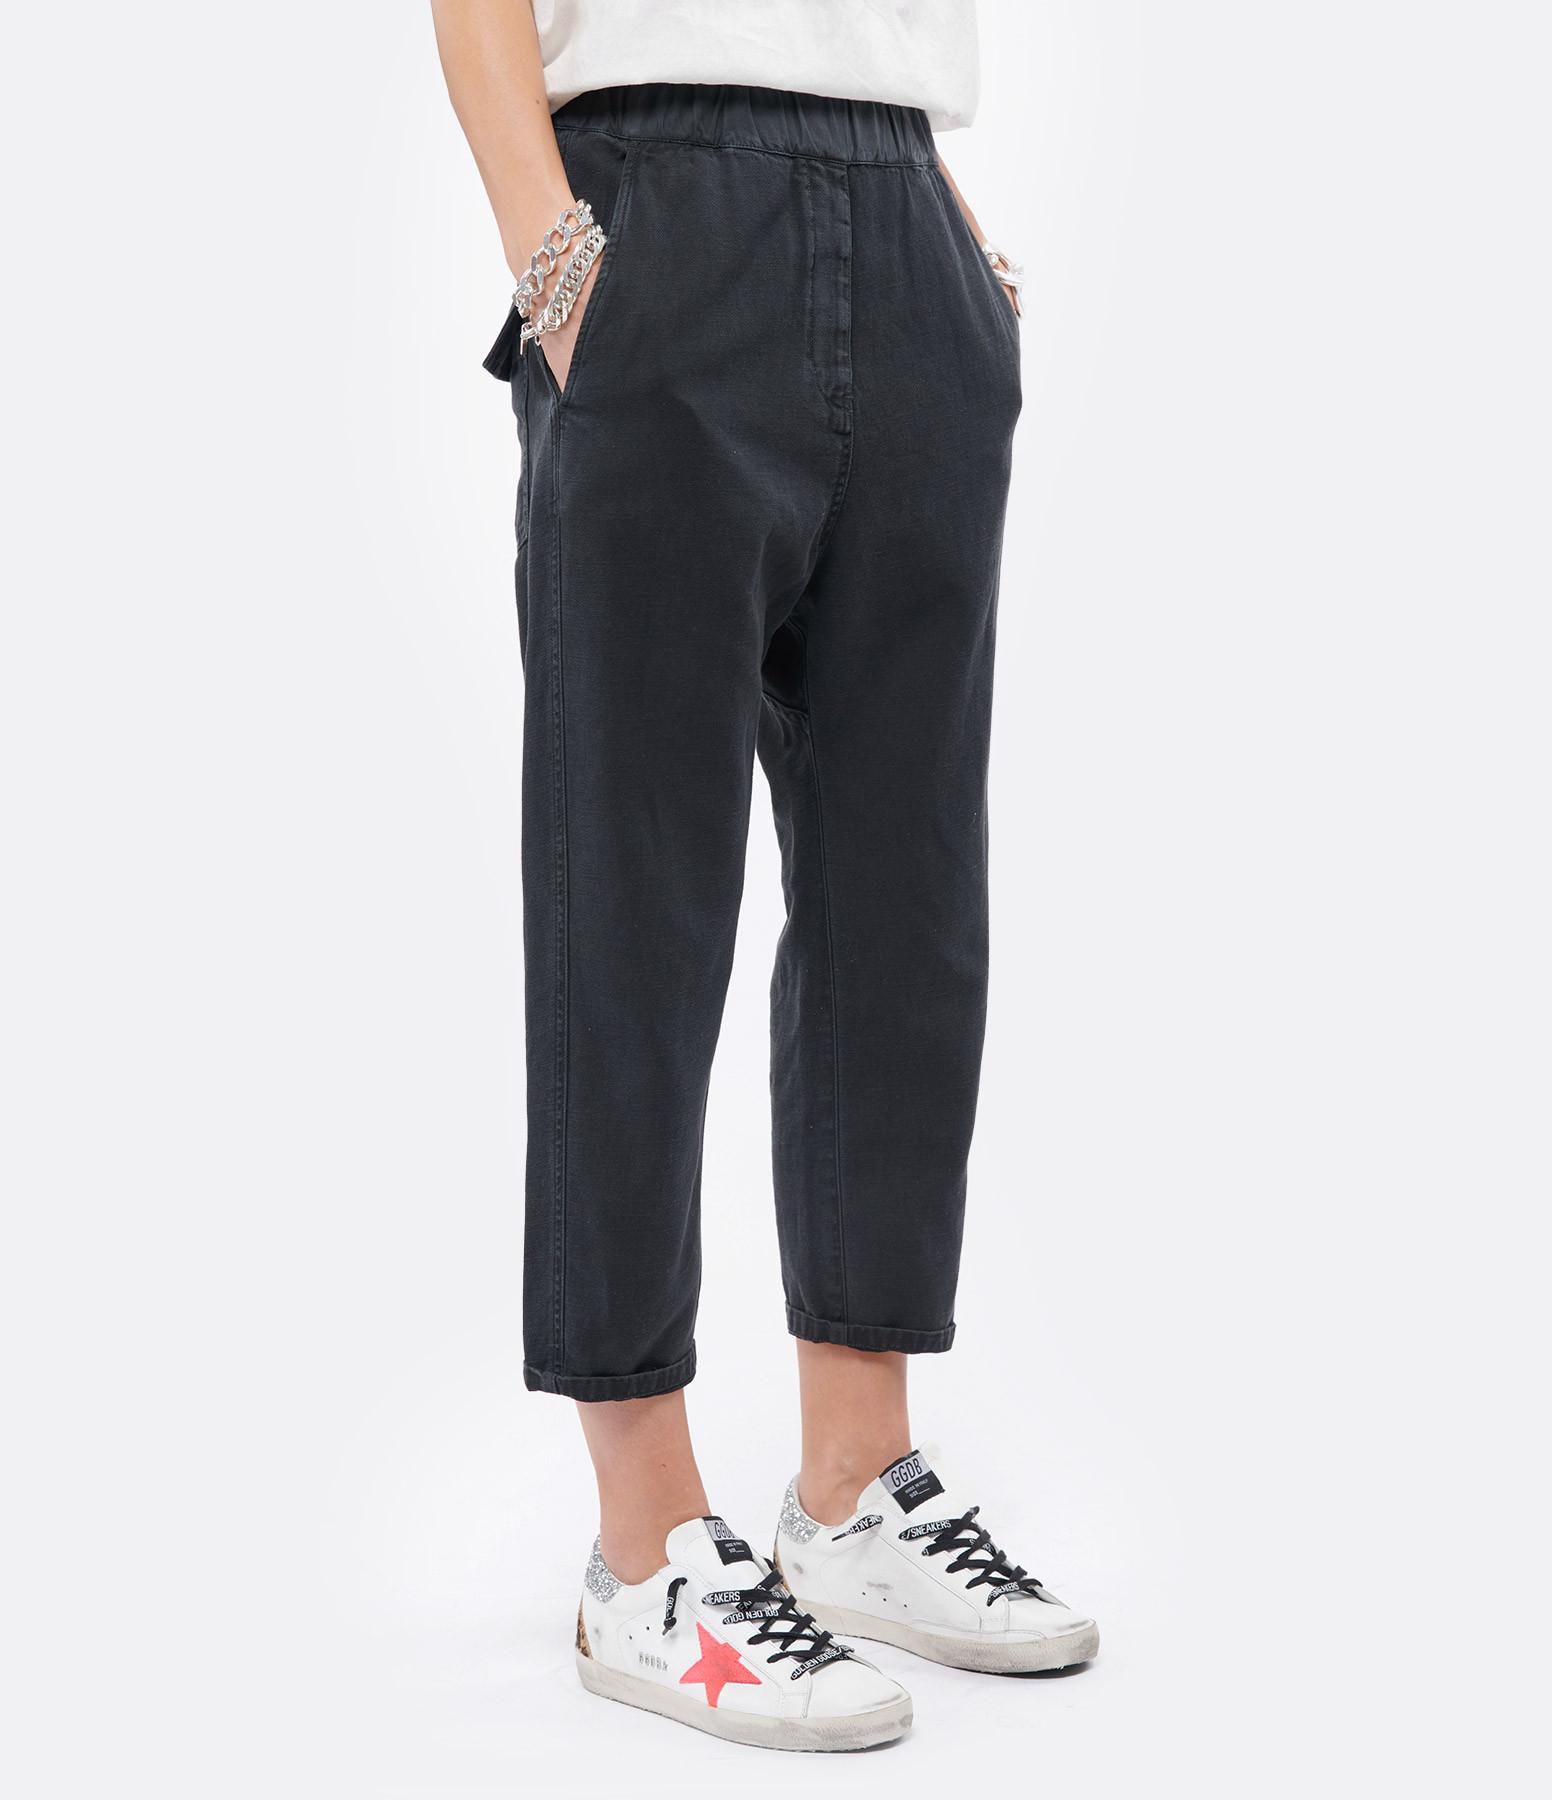 NILI LOTAN - Pantalon Casablanca Carbone